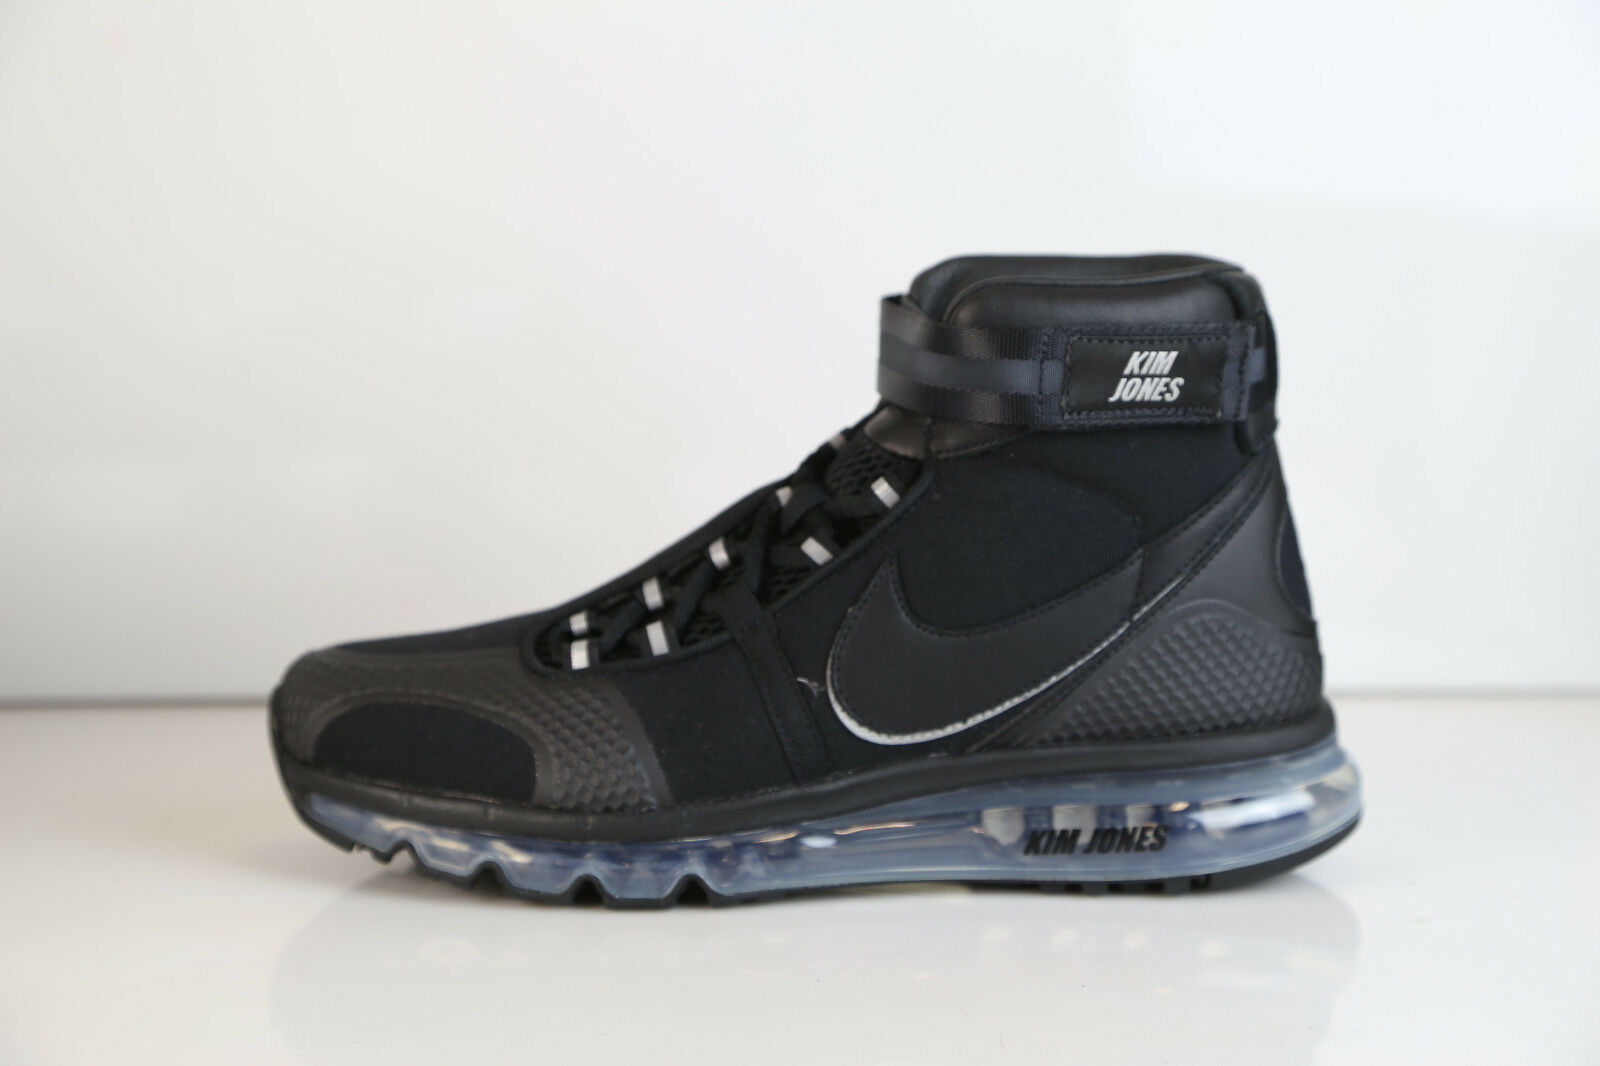 Nike Air Max 360 Hi KJ Kim Jones Black AO2313-001 8-12 1